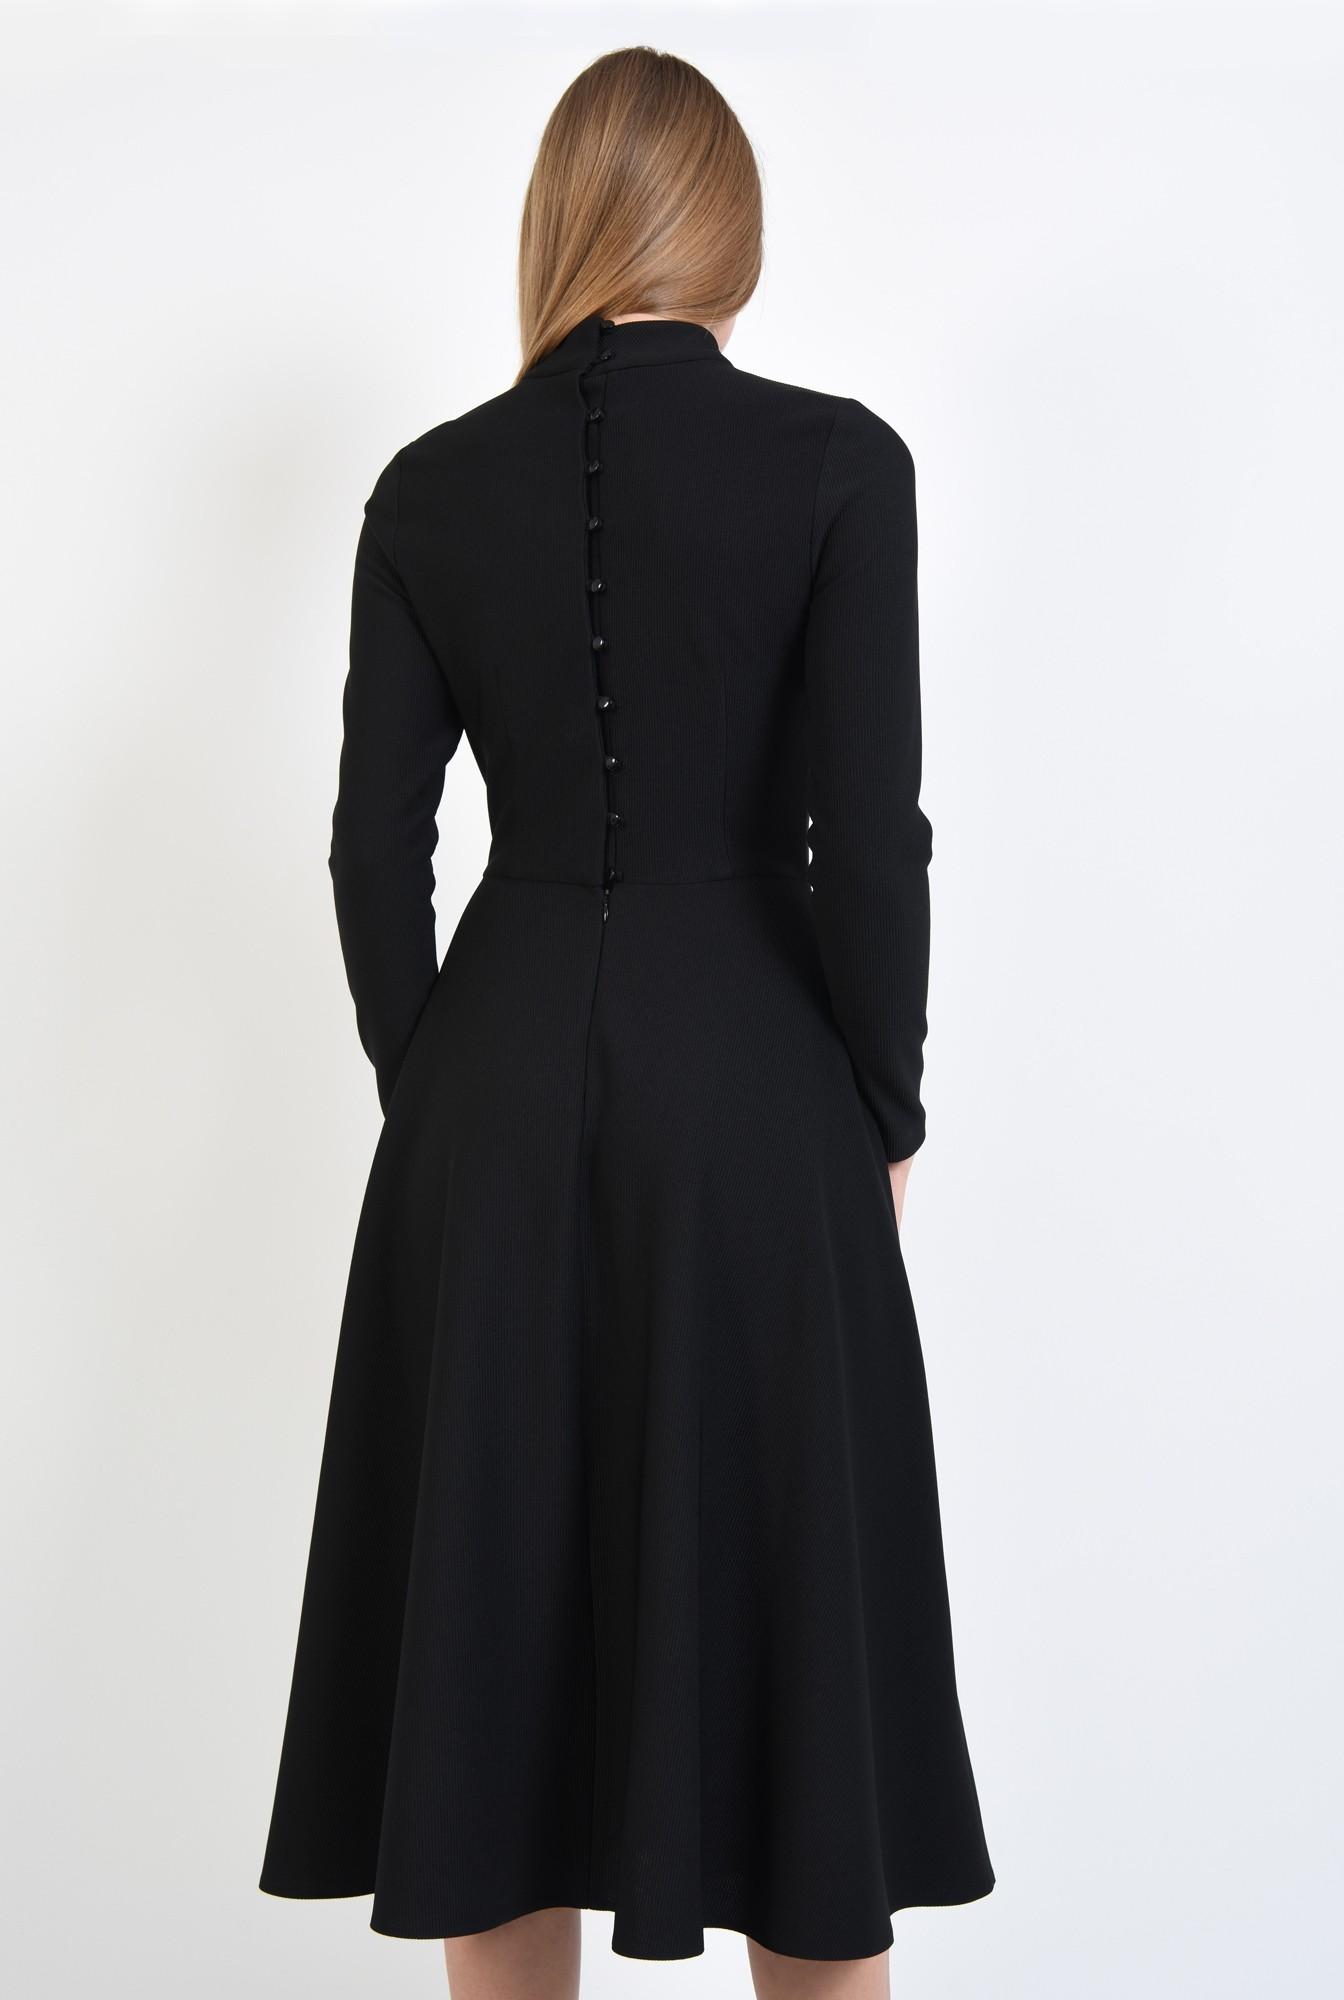 1 - rochie casual, neagra, evazata, nasturi la spate, guler inalt